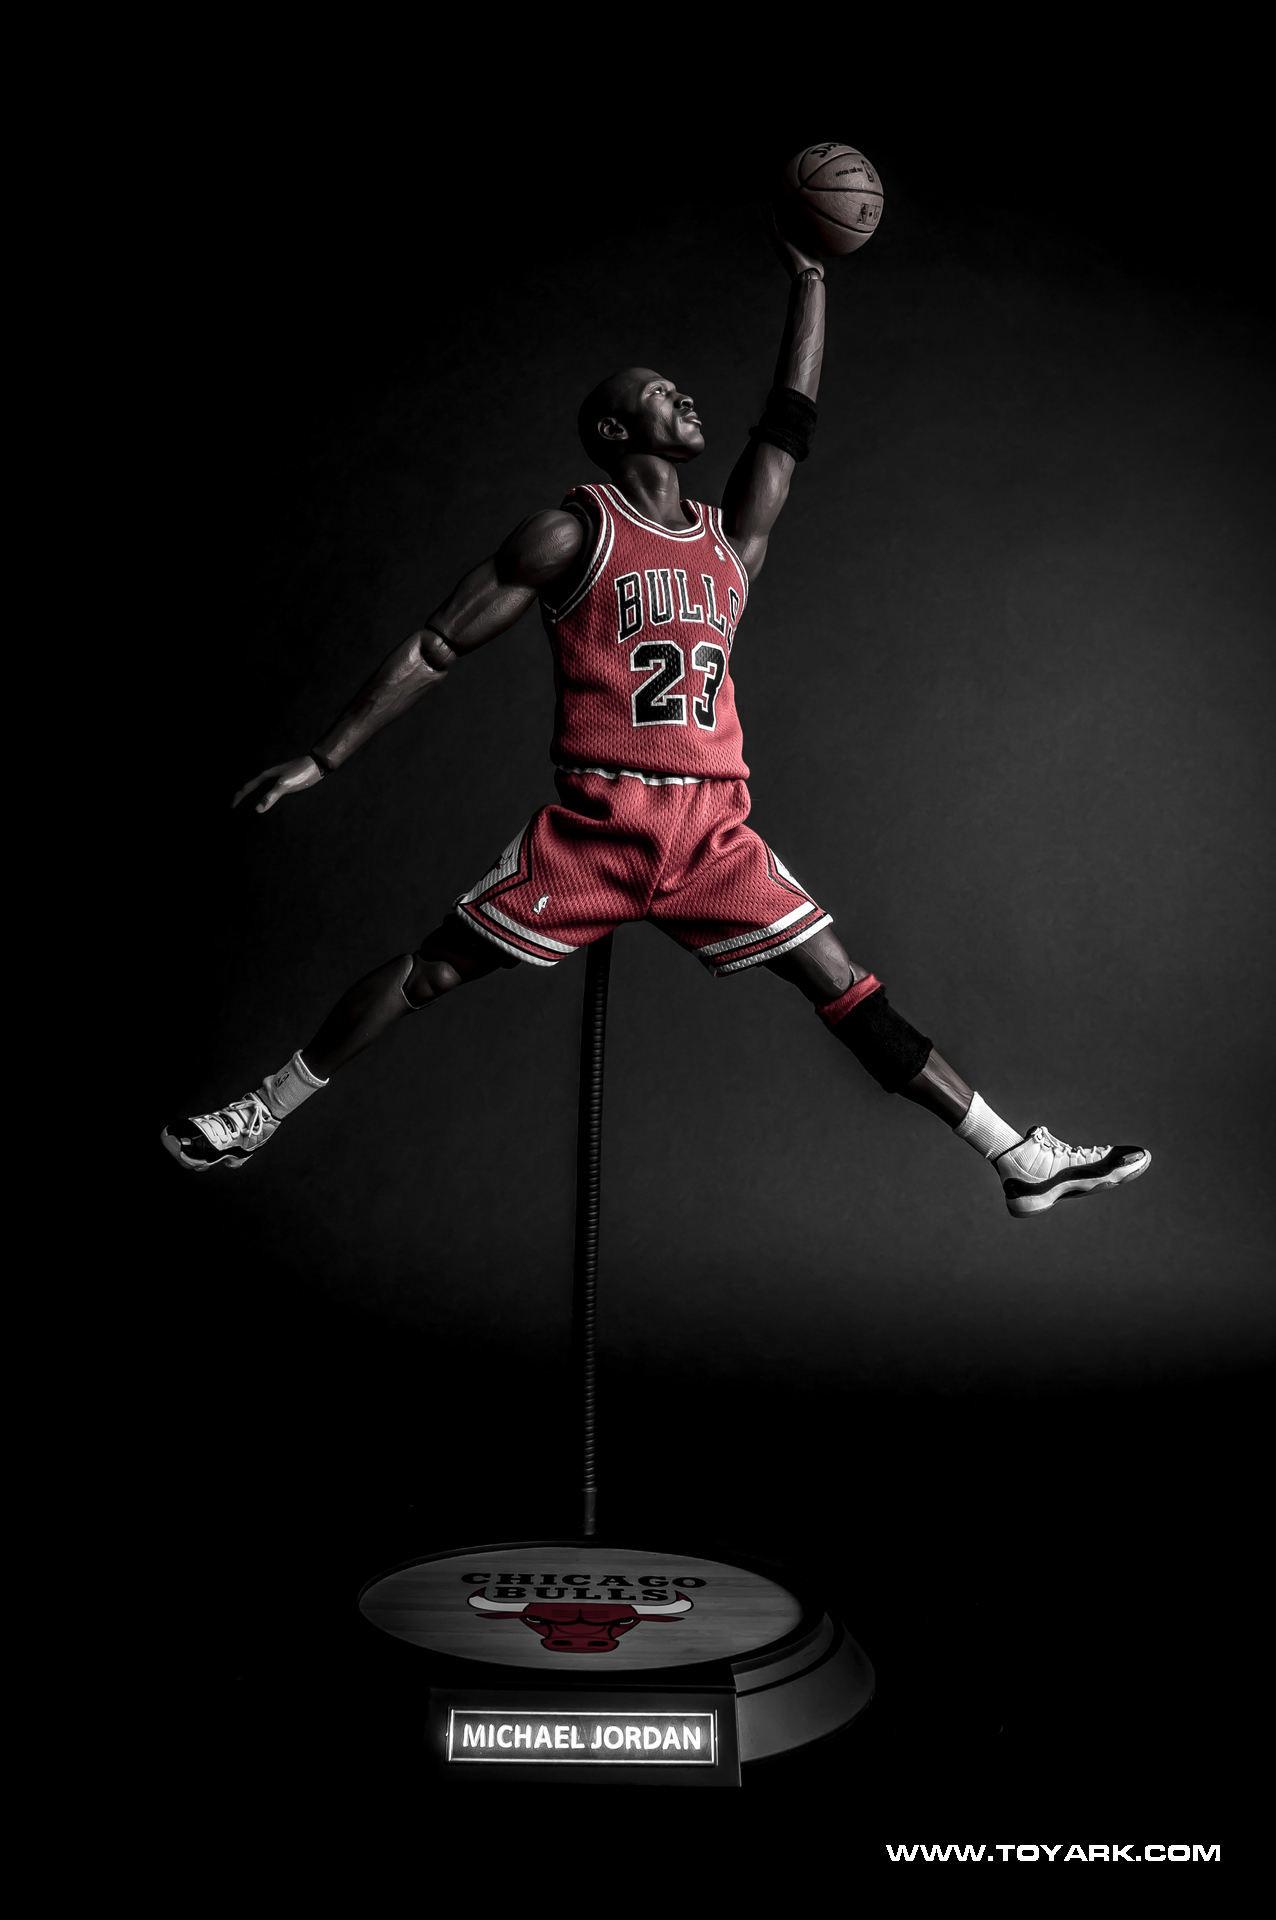 Cool Michael Jordan Wallpaper 1 Jordan Jumpman Wallpaper Iphone 251355 Hd Wallpaper Backgrounds Download